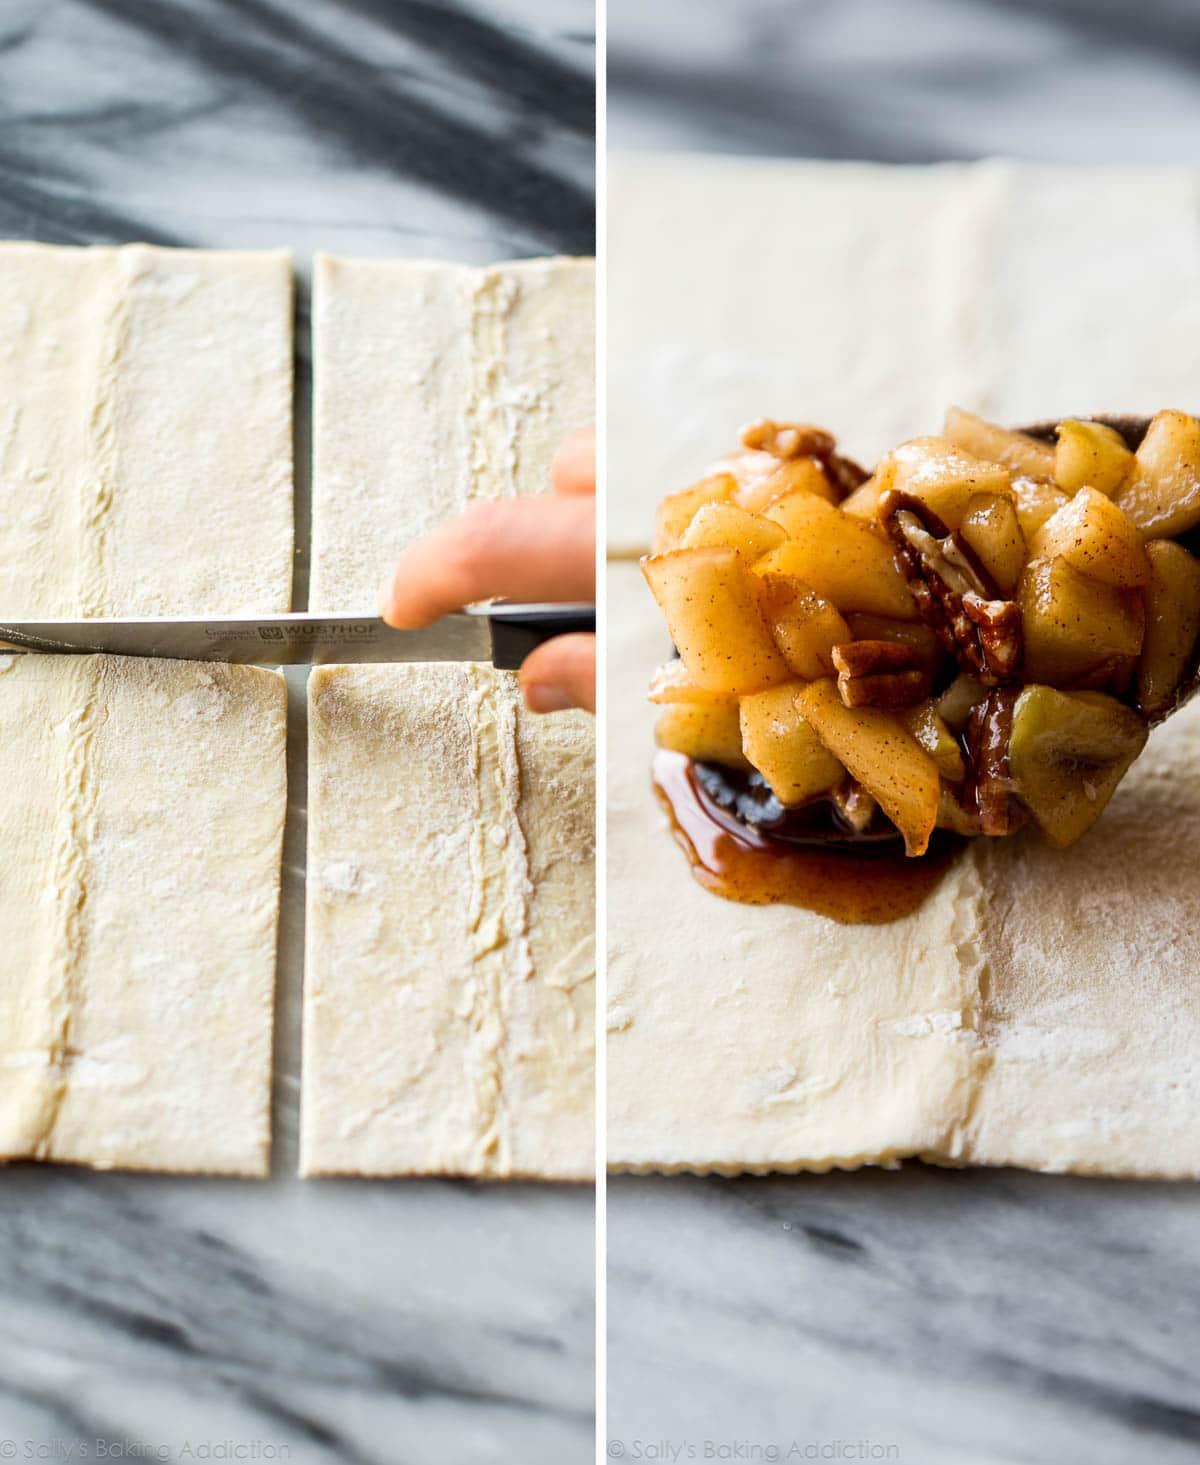 How to make easy caramel apple turnovers on sallysbakingaddiction.com